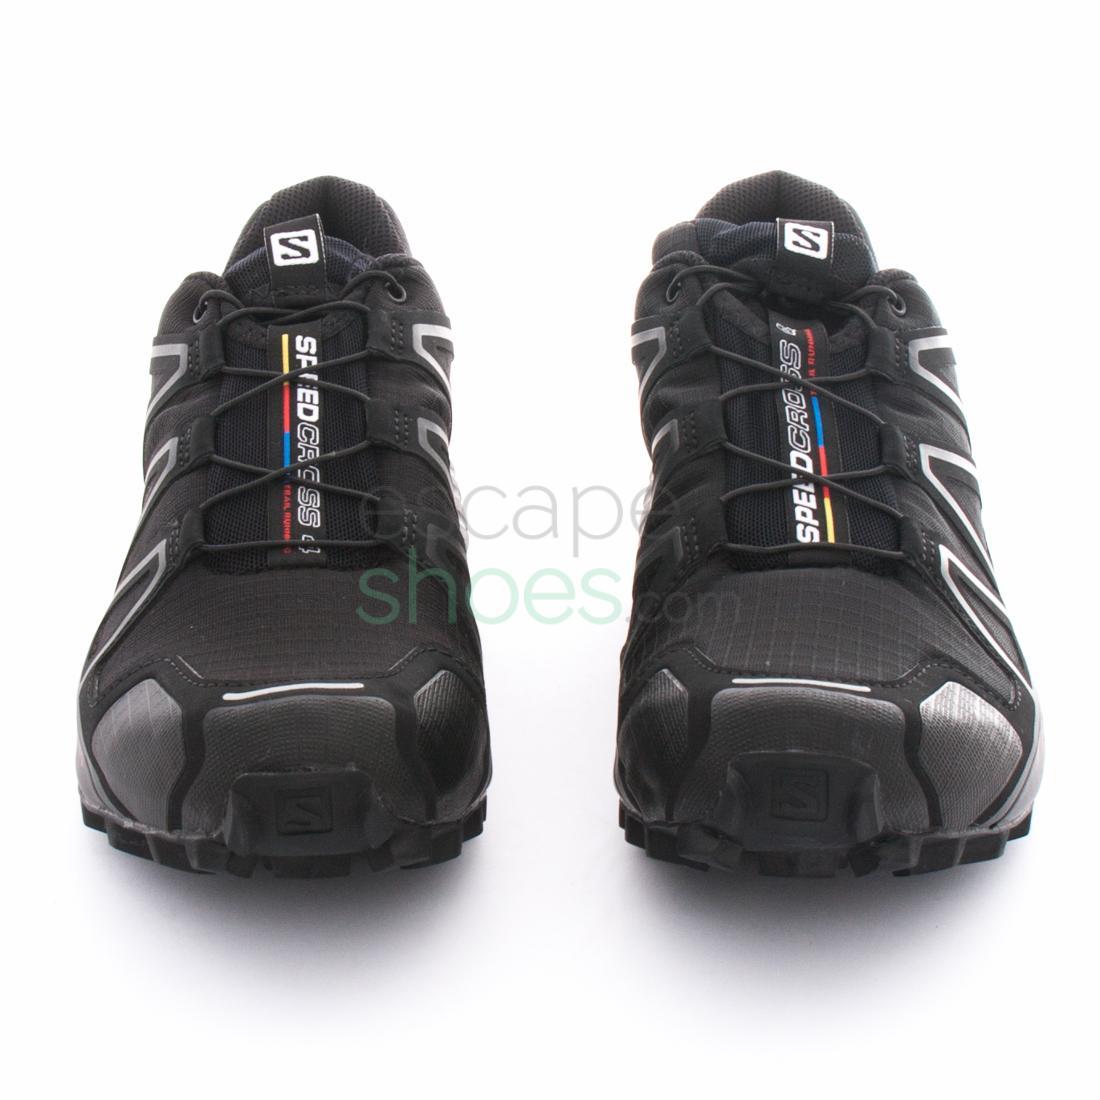 Sneakers SALOMON Speedcross 4 Black Metallic 383130